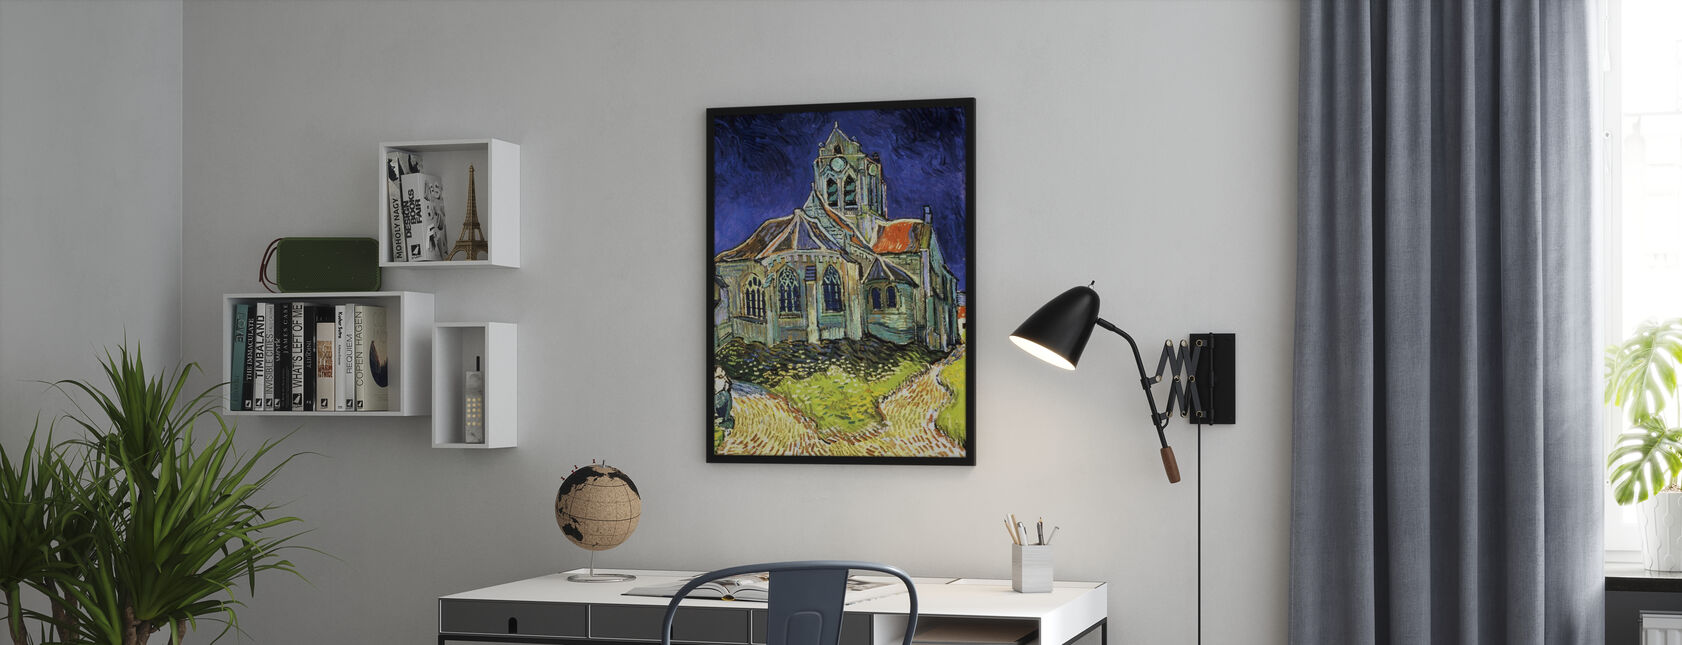 Church at Auvers-sur-Oise - Vincent van Gogh - Framed print - Office